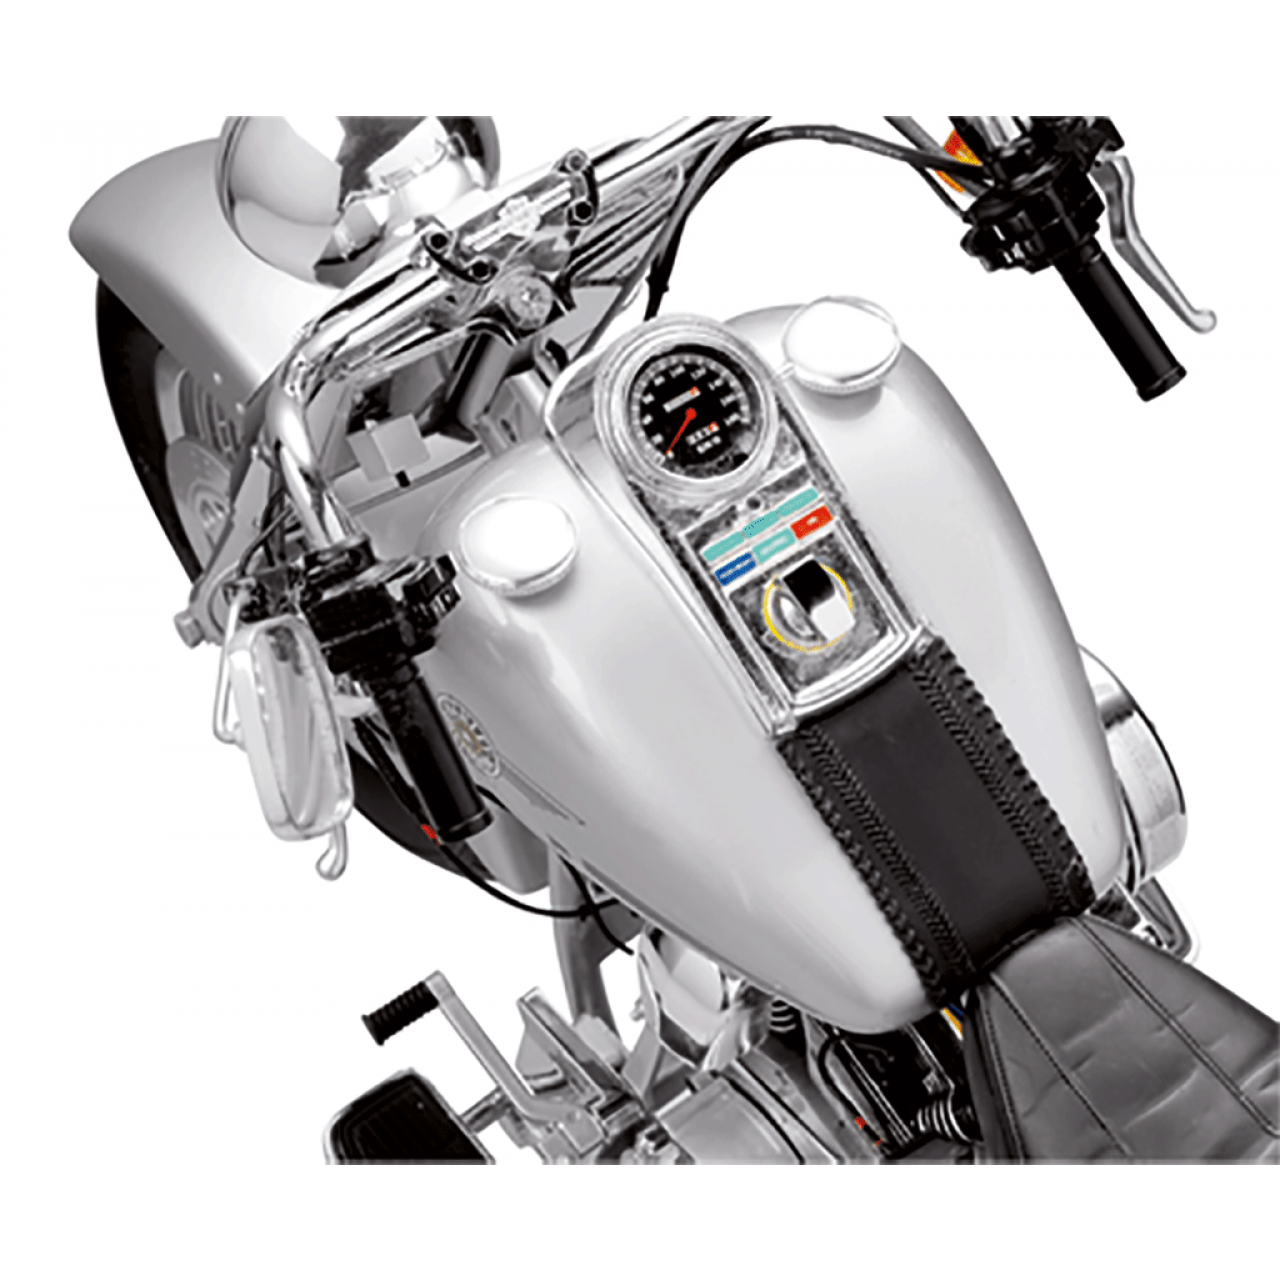 Harley Davidson Fat Boy Model 1:4 Scale | ModelSpace